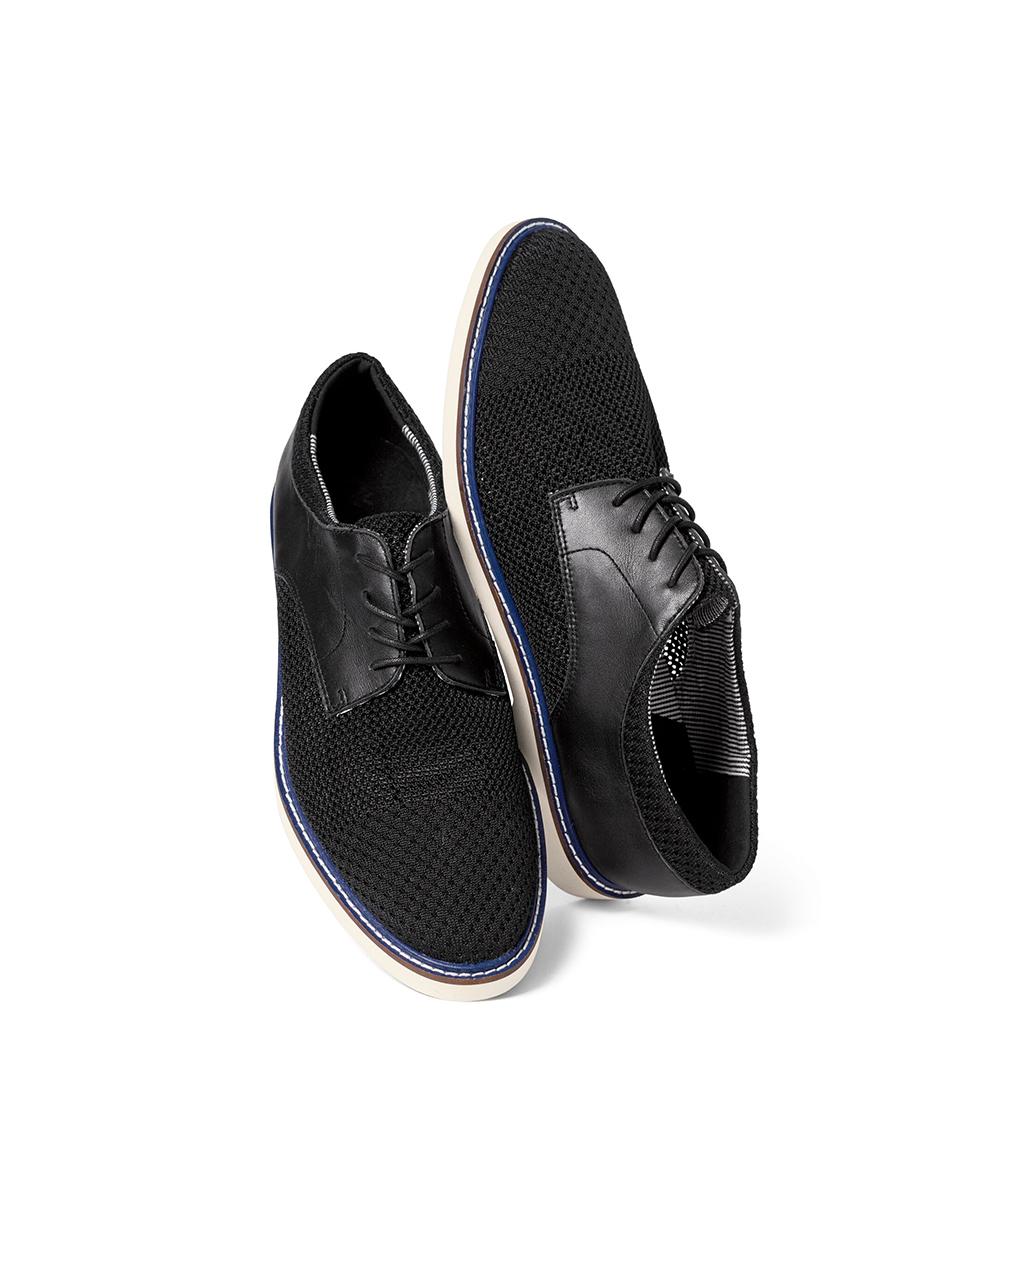 zapatos de hombre nueva colecci n 2017 2018 benetton